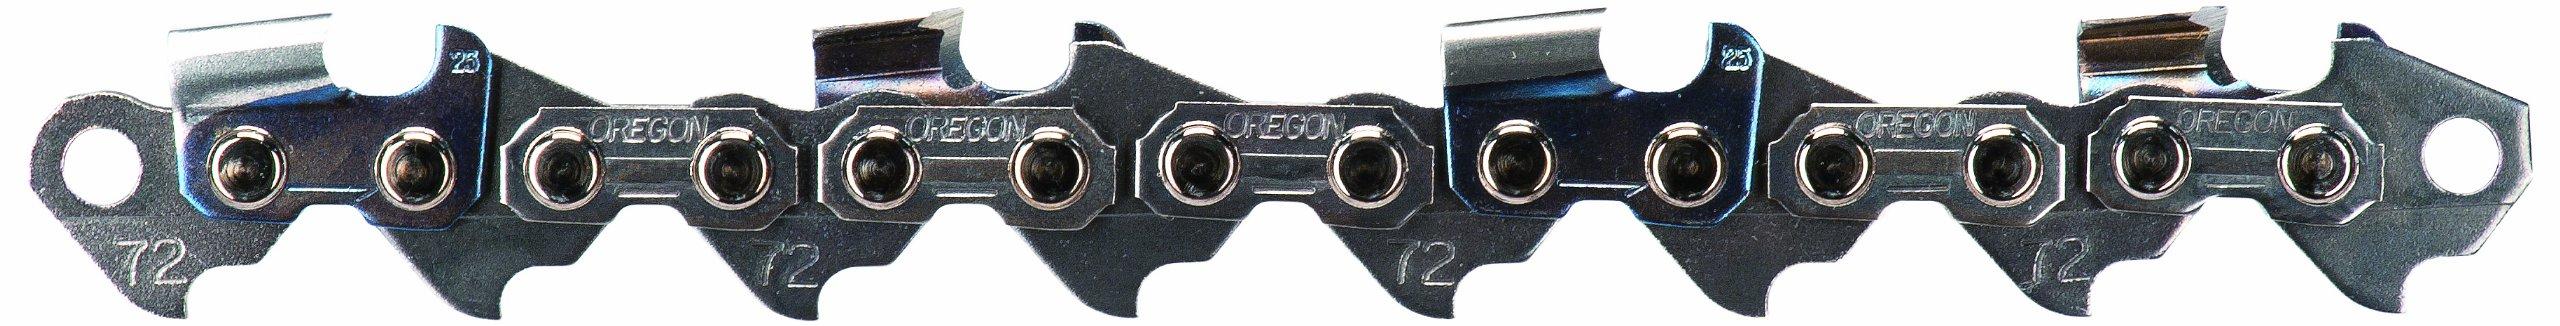 Oregon 72DPX100U VersaCut Saw Chain, 100' Reel